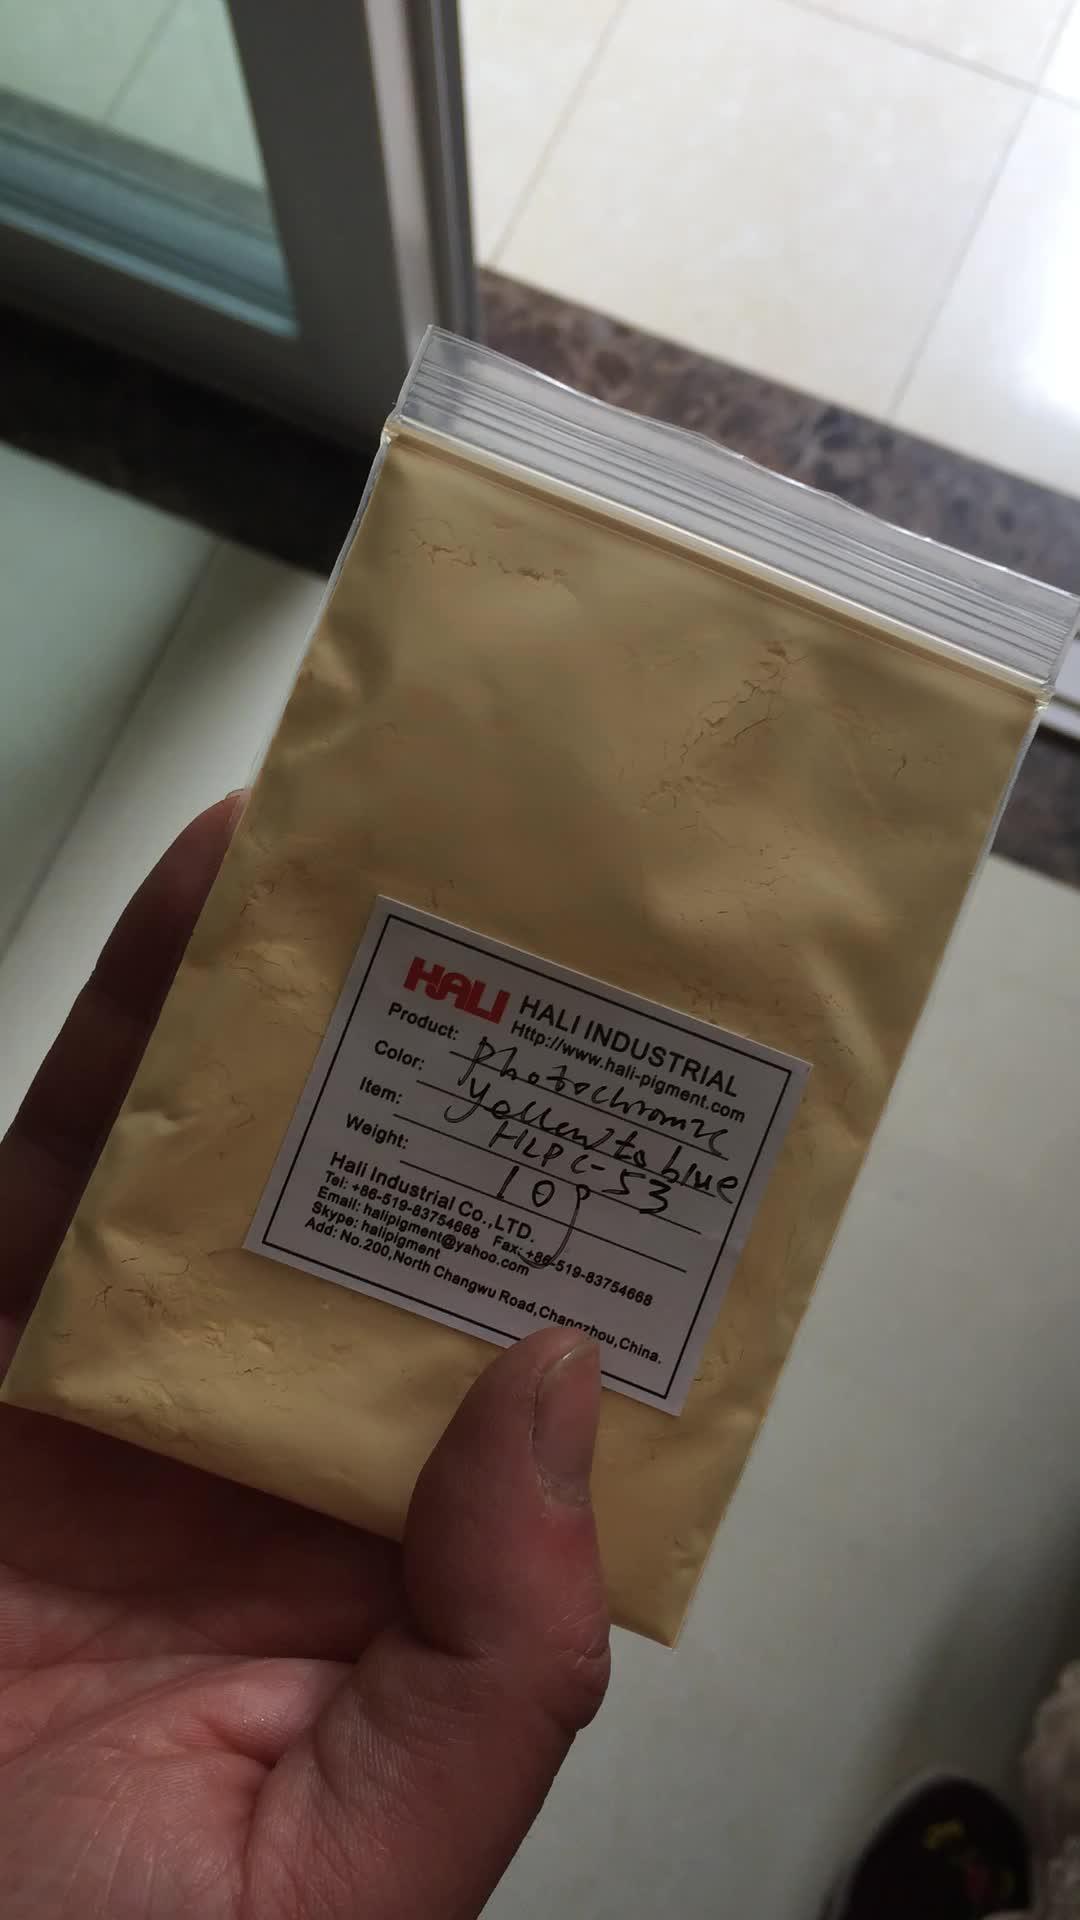 photochromic pigment, paint powder, sunlight sensitive, item:HLPC-53, yellow to blue